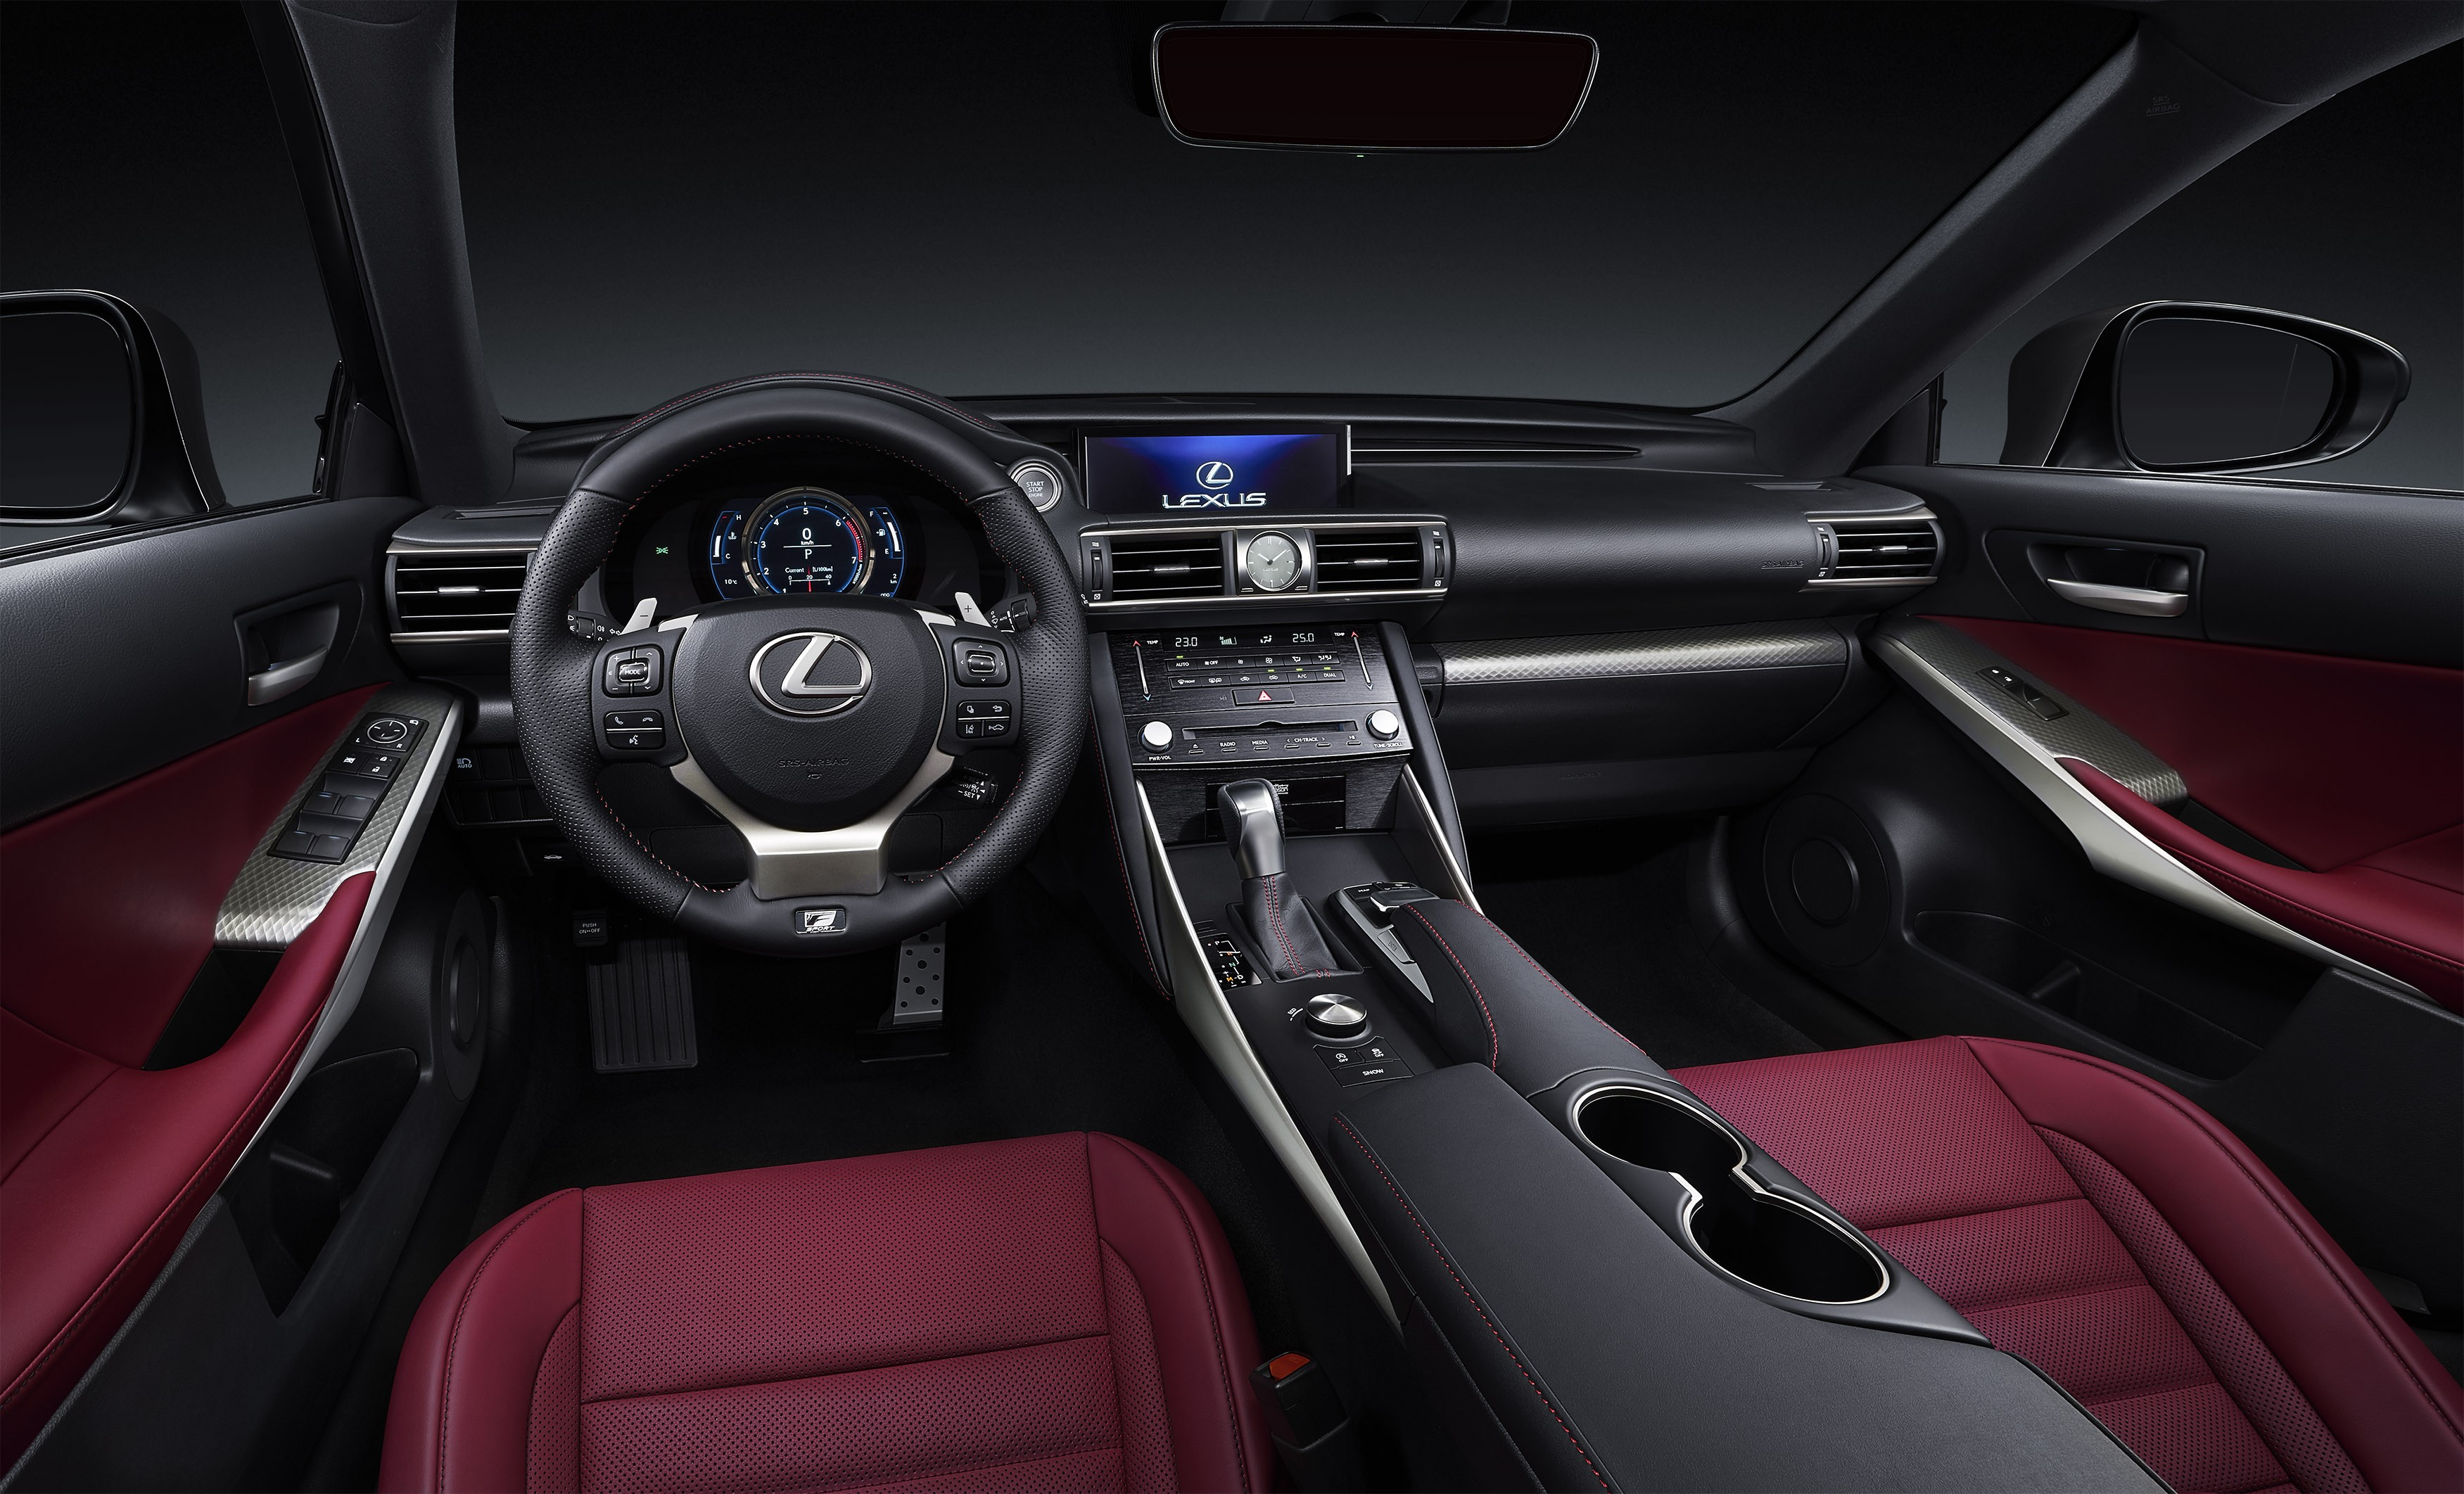 2017 Lexus Is Sedan